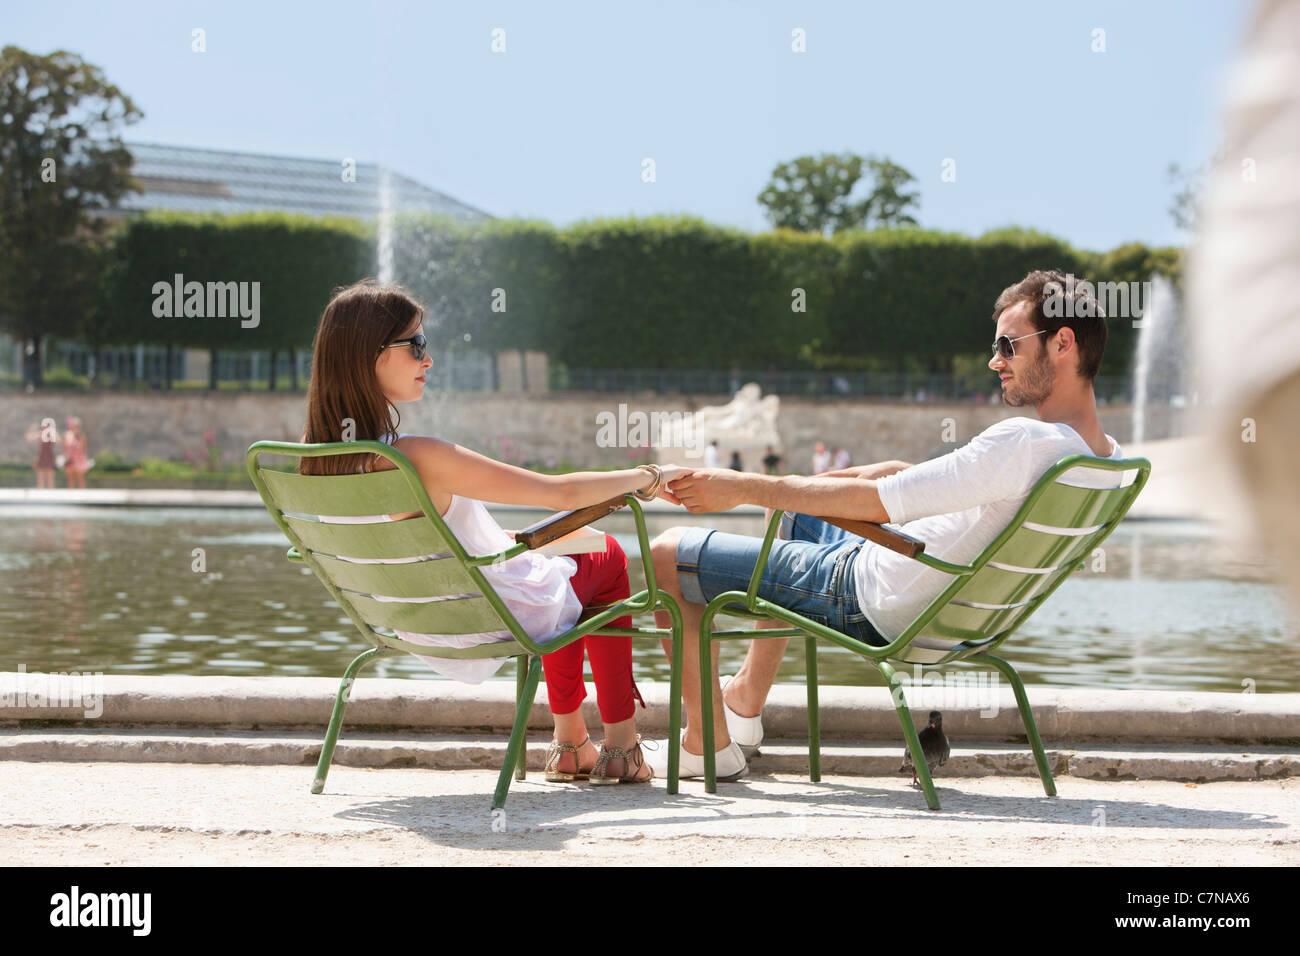 Couple sitting in chairs near a pond, Bassin octogonal, Jardin des Tuileries, Paris, Ile-de-France, France - Stock Image